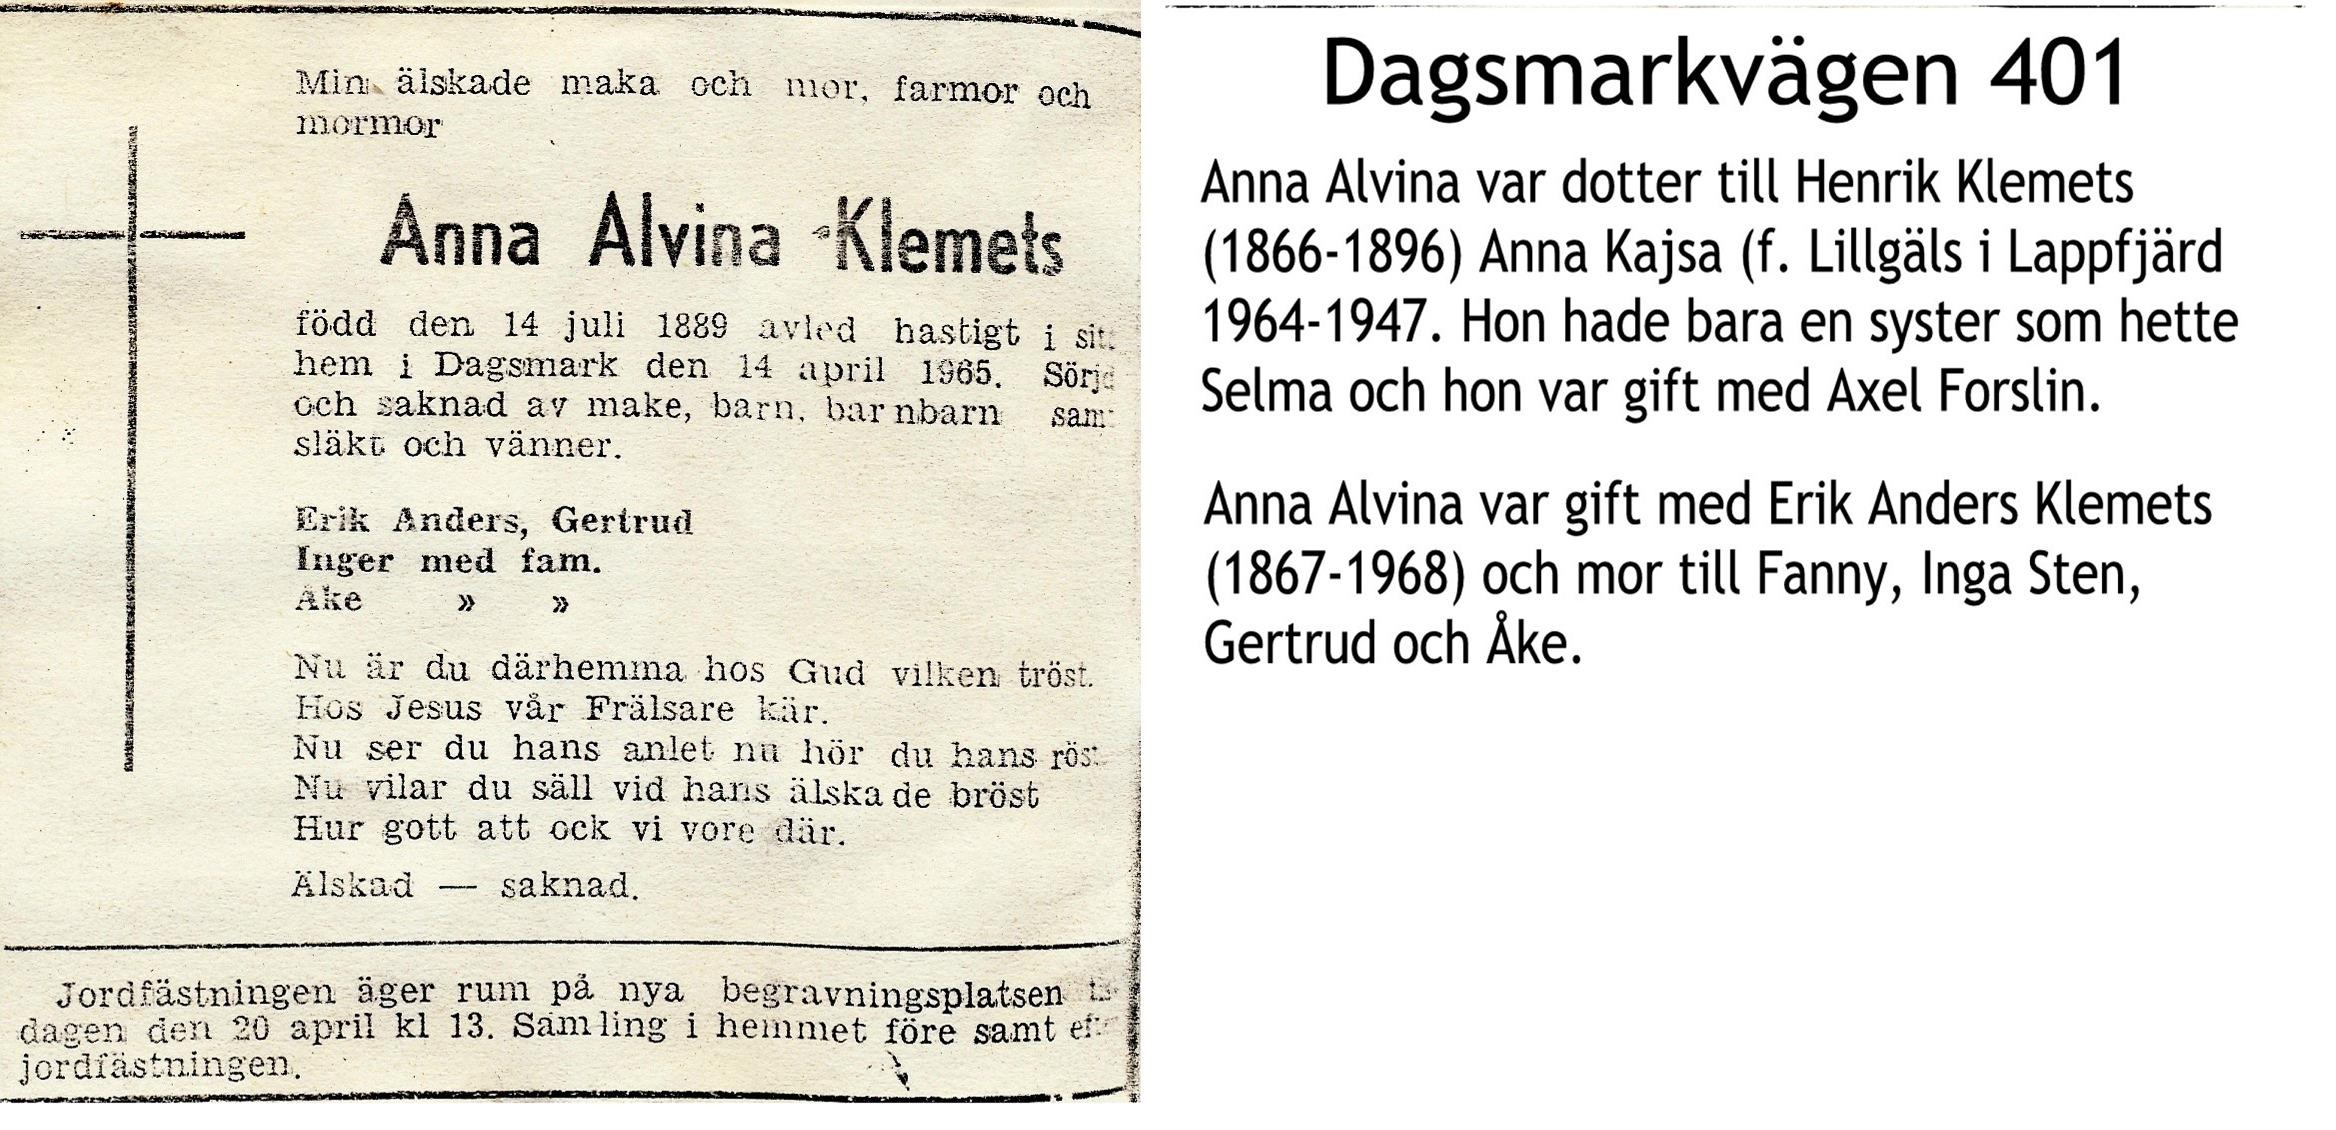 Klemets Anna Alvina